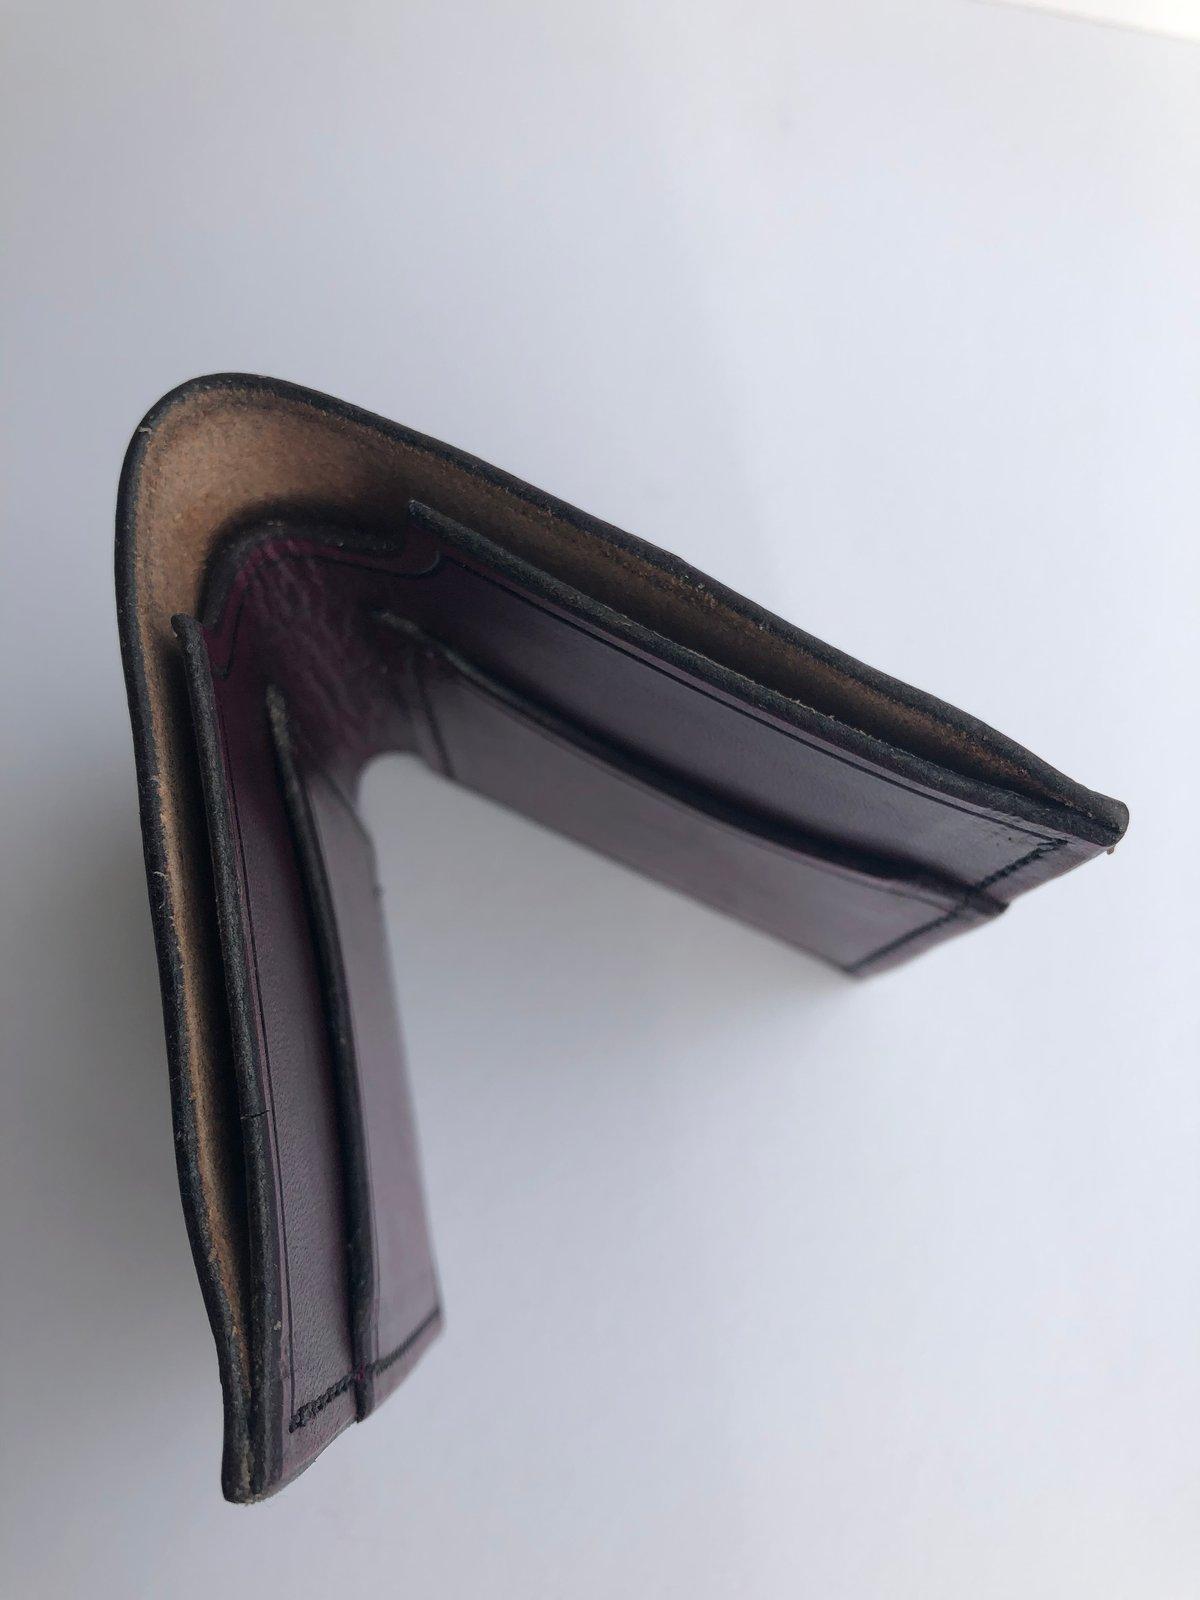 Image of 2 card slot folding wallet